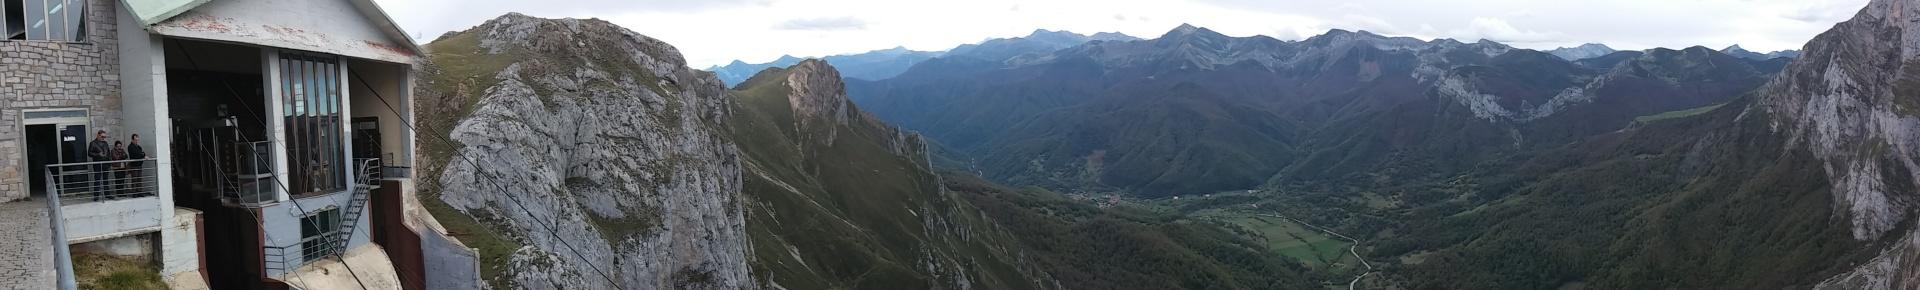 teleferico-fuente-de-panoramica